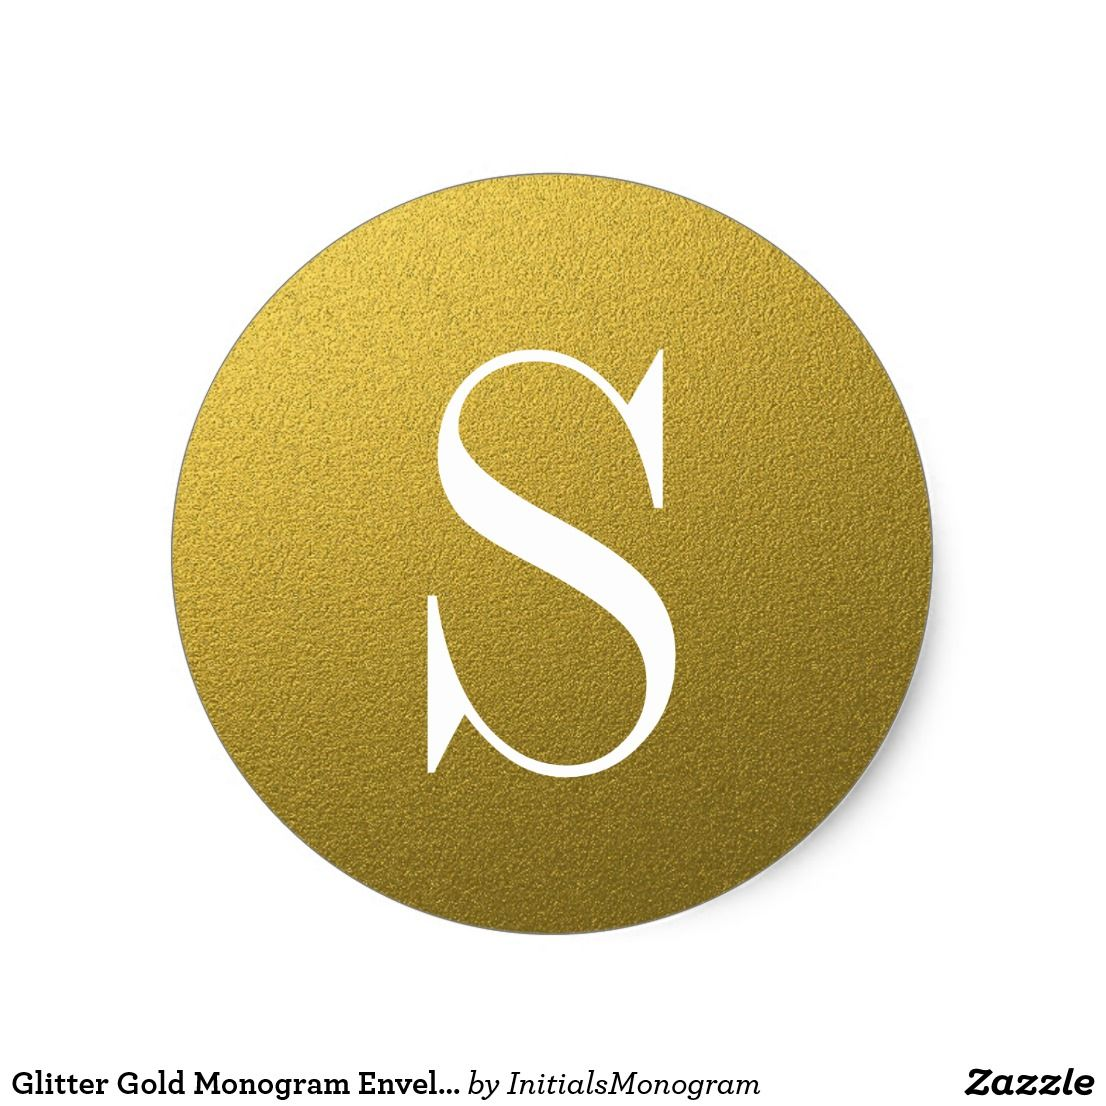 monogram wedding envelope seals sticker%0A Glitter Gold Monogram Envelope Seal